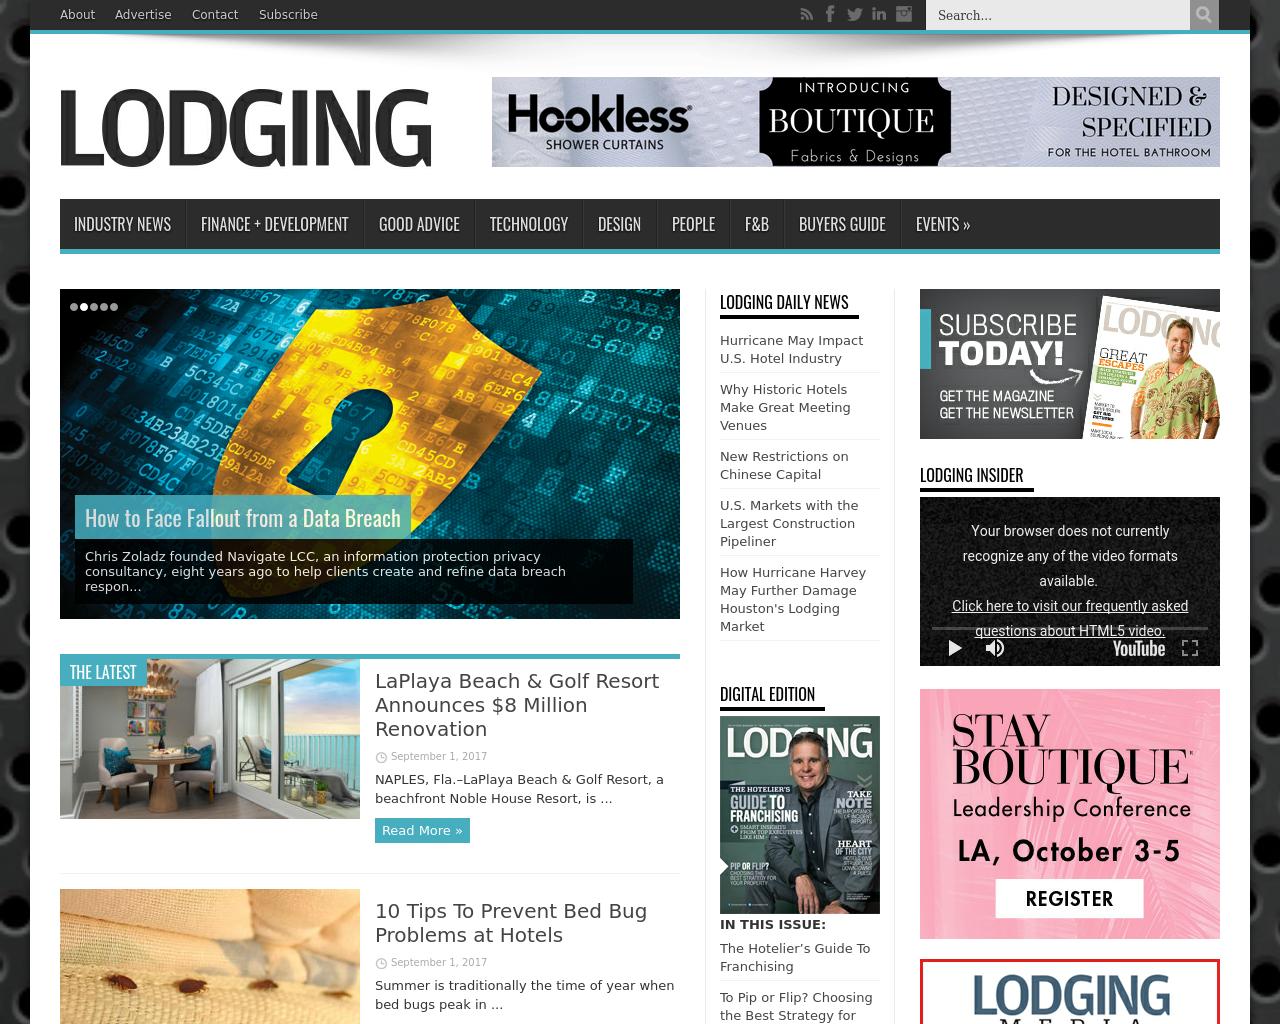 LODGING-Advertising-Reviews-Pricing